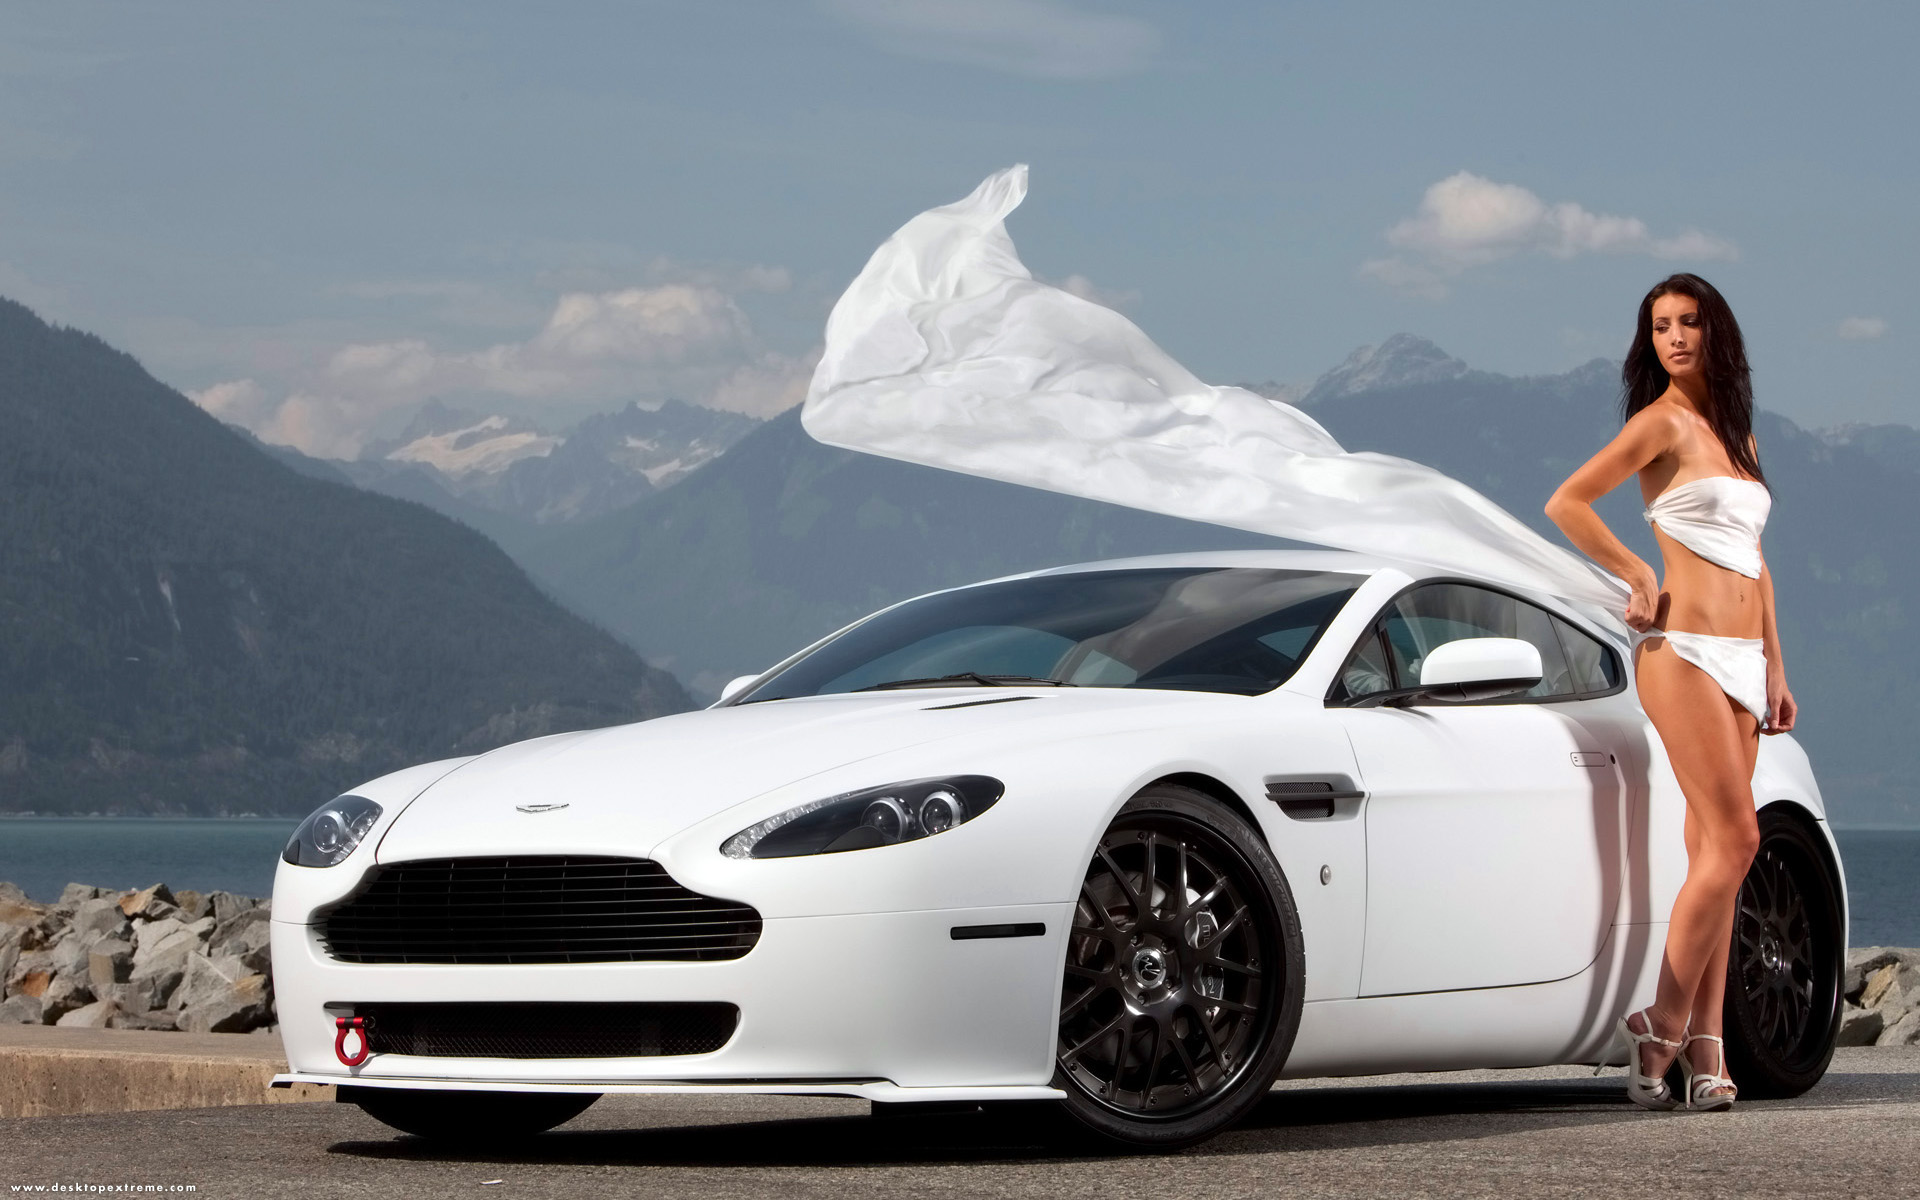 Aston Martin V Vantage HD Wallpaper Background Image X - Aston martin latest models